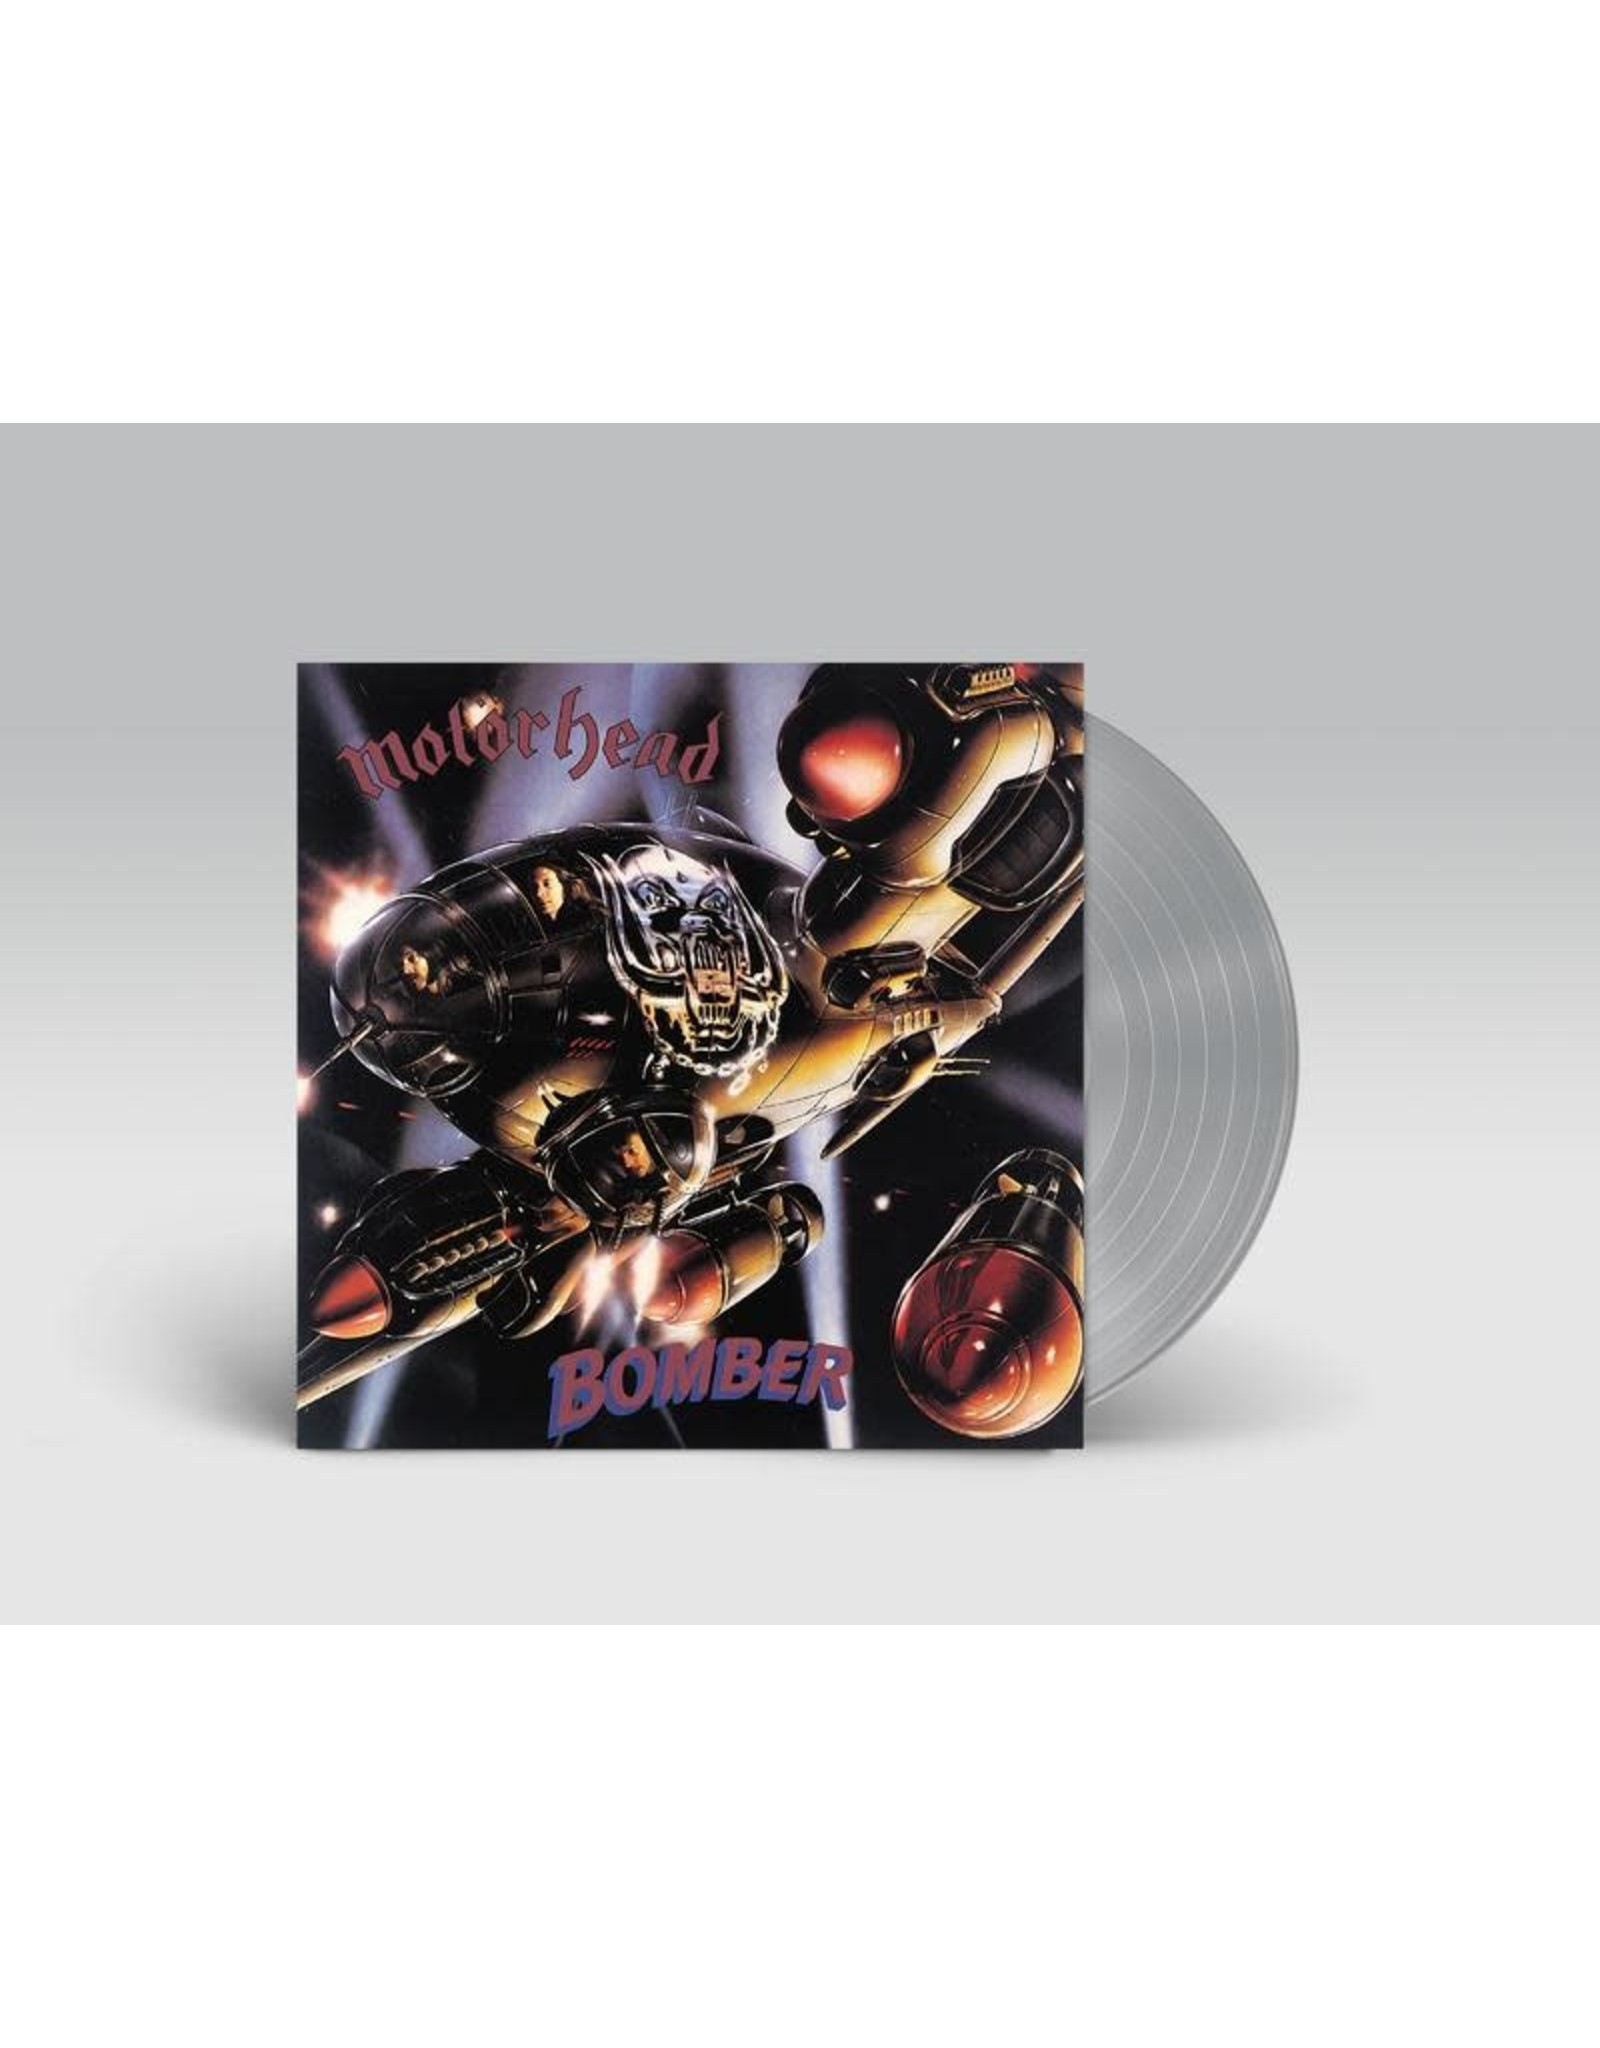 Motorhead - Bomber LP (Limited Edition Silver Vinyl)